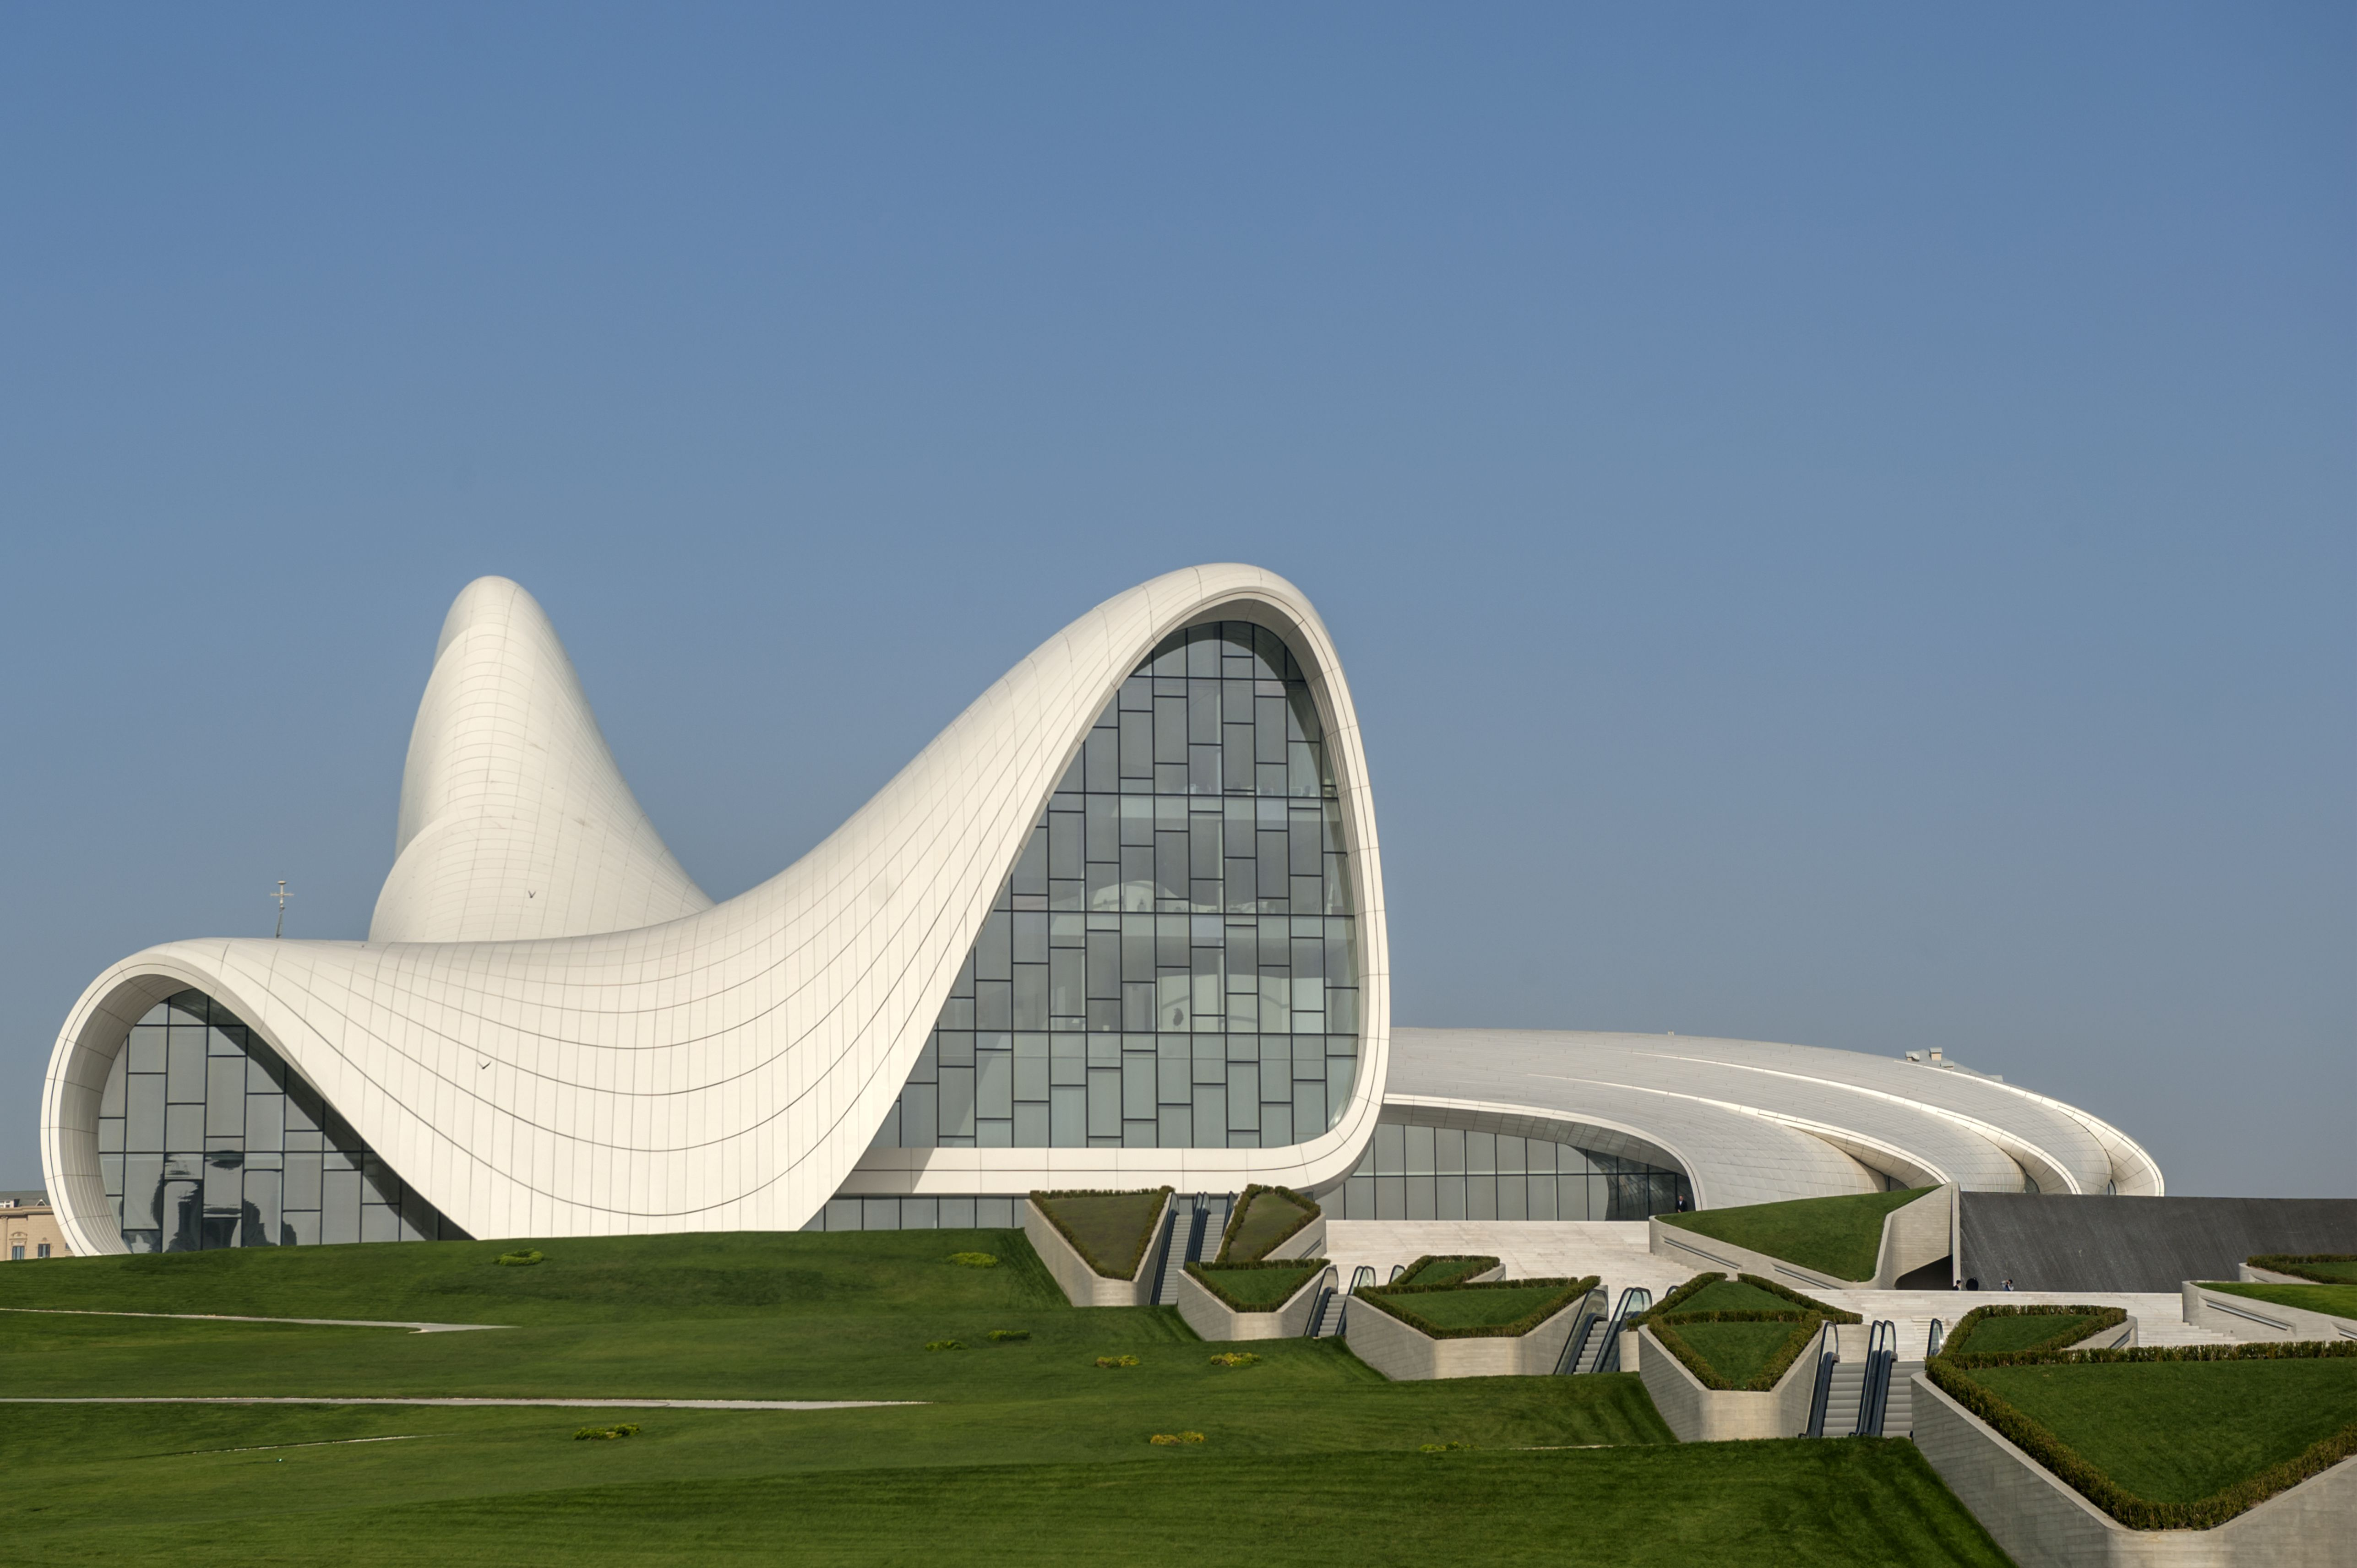 White curves of the Heydar Aliyev Center in Azerbaijan, designed by Zaha Hadid